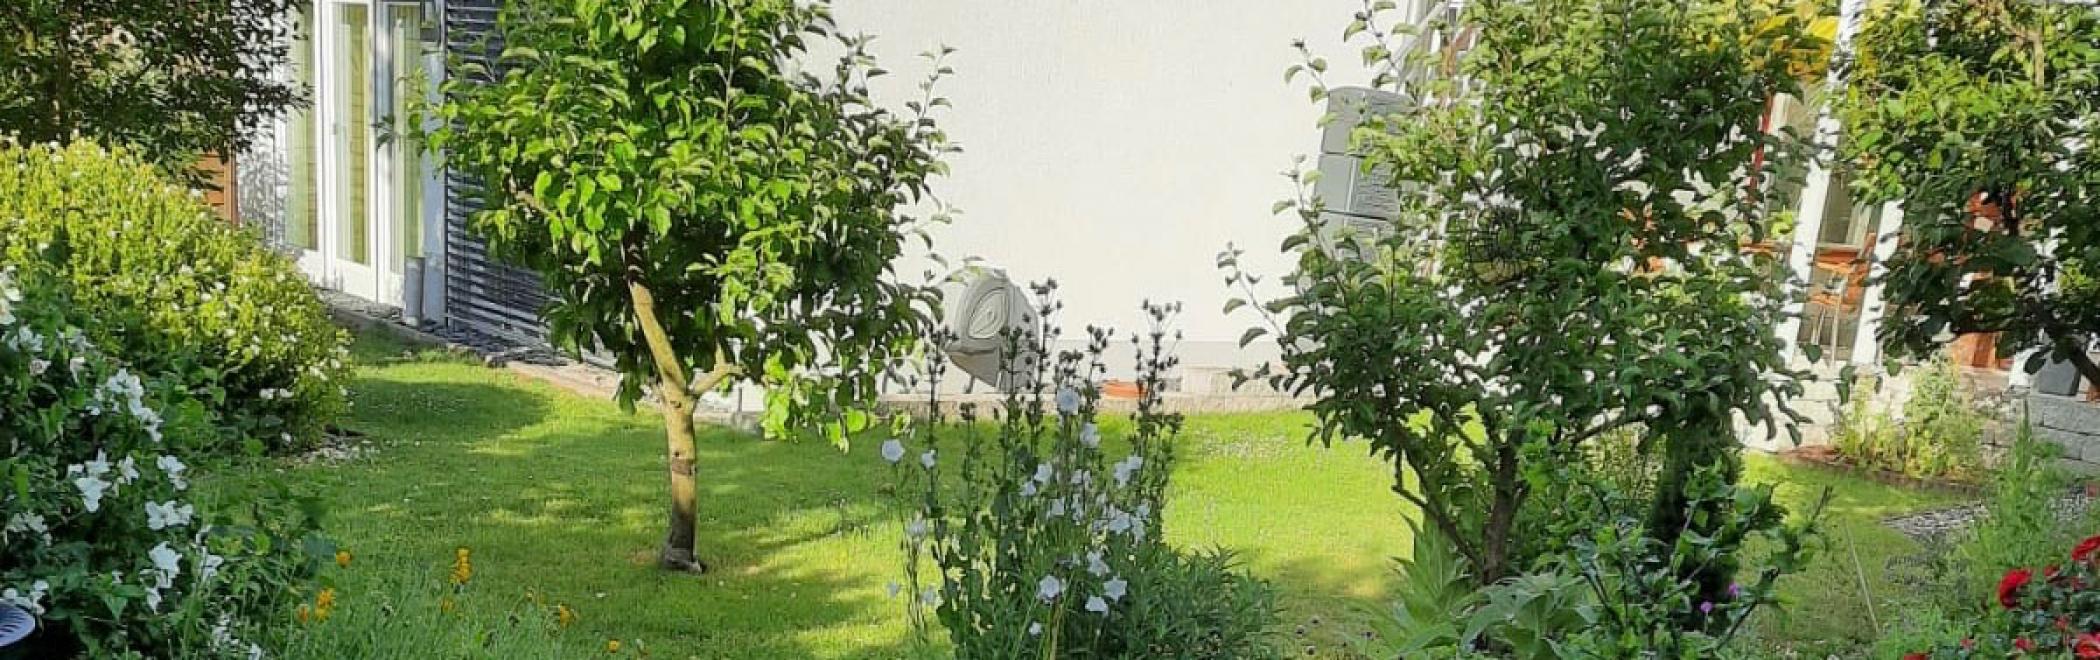 HI-Kirchstr.-Garten-Anbau